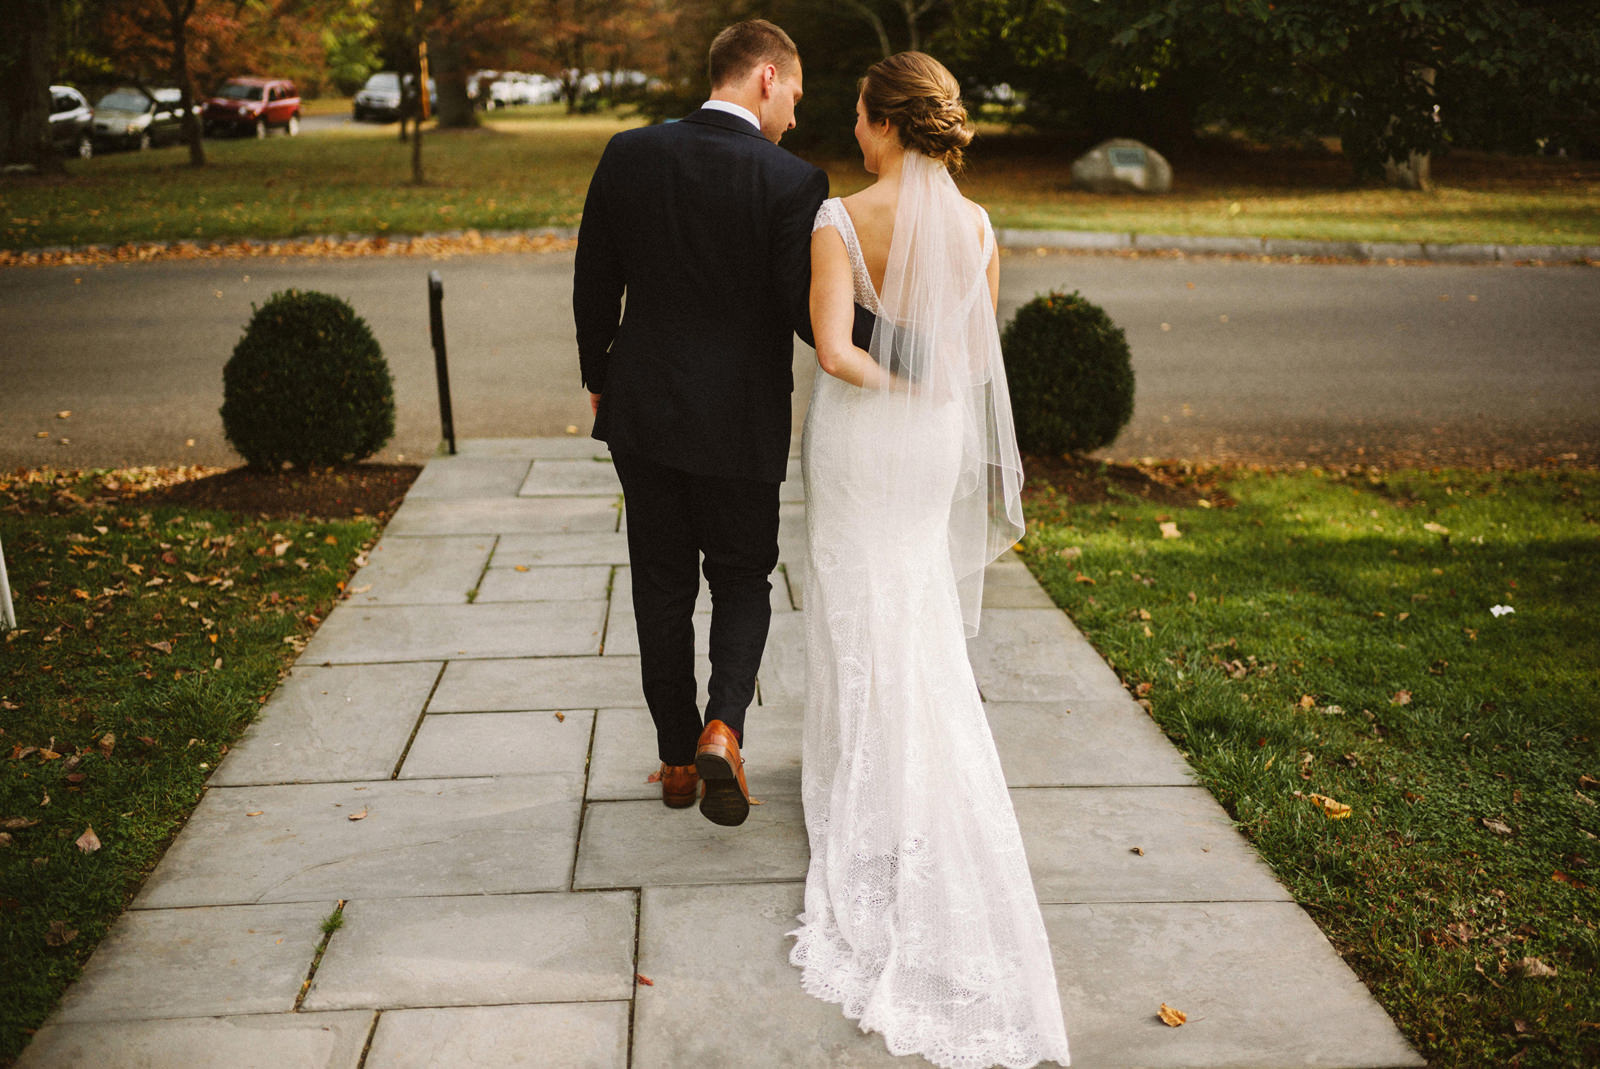 bridgeport-wedding-094 BRIDGEPORT, CONNECTICUT BACKYARD WEDDING